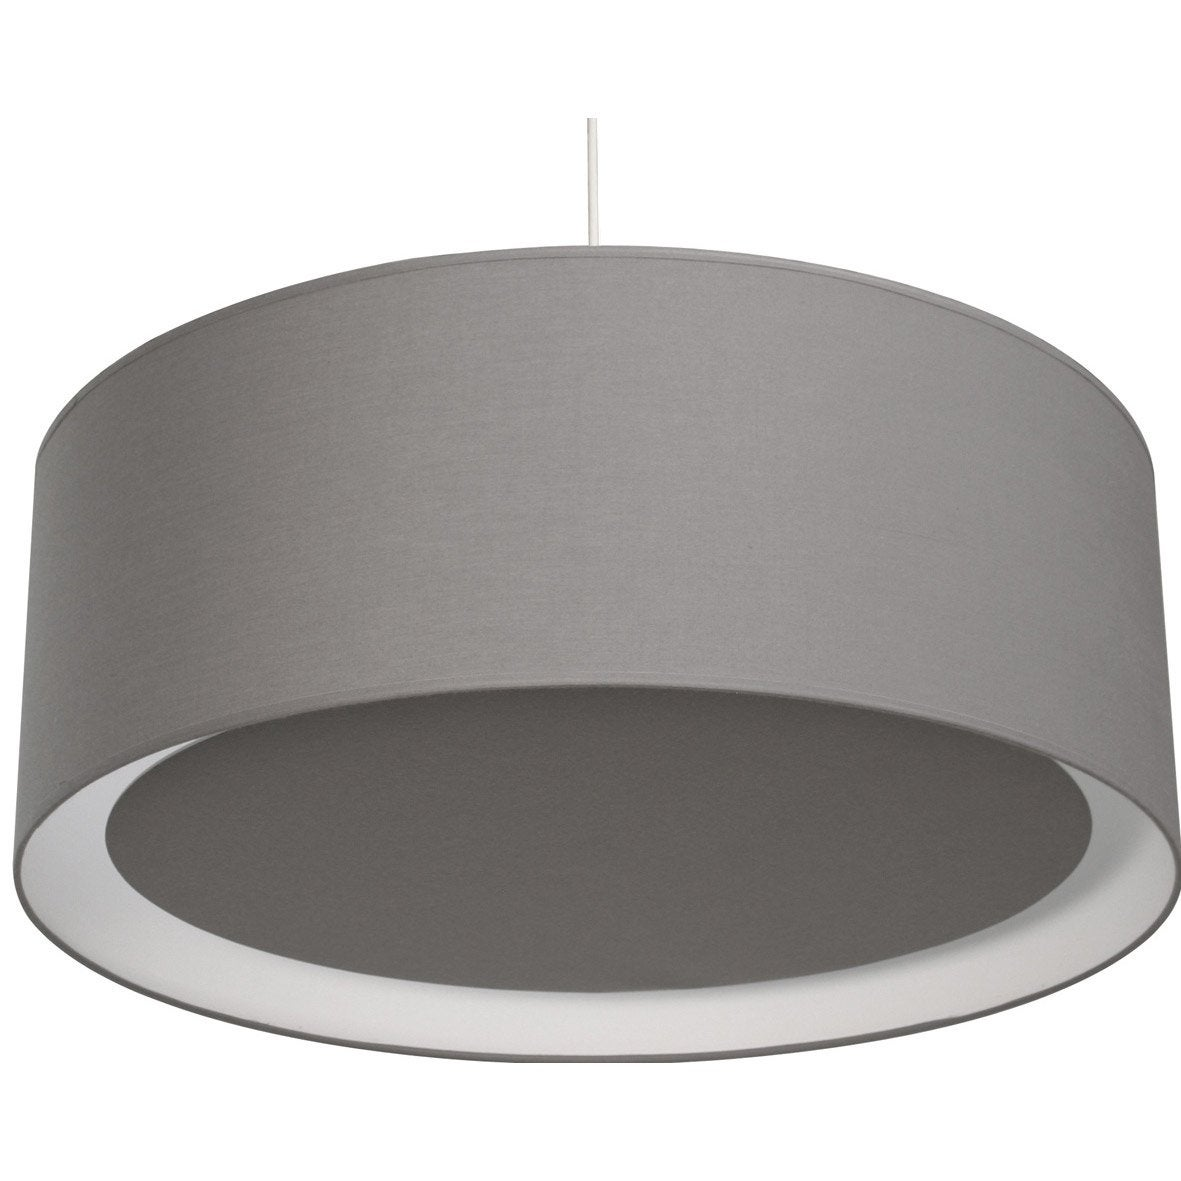 suspension essentiel inspire gris galet n 3 60 watts. Black Bedroom Furniture Sets. Home Design Ideas